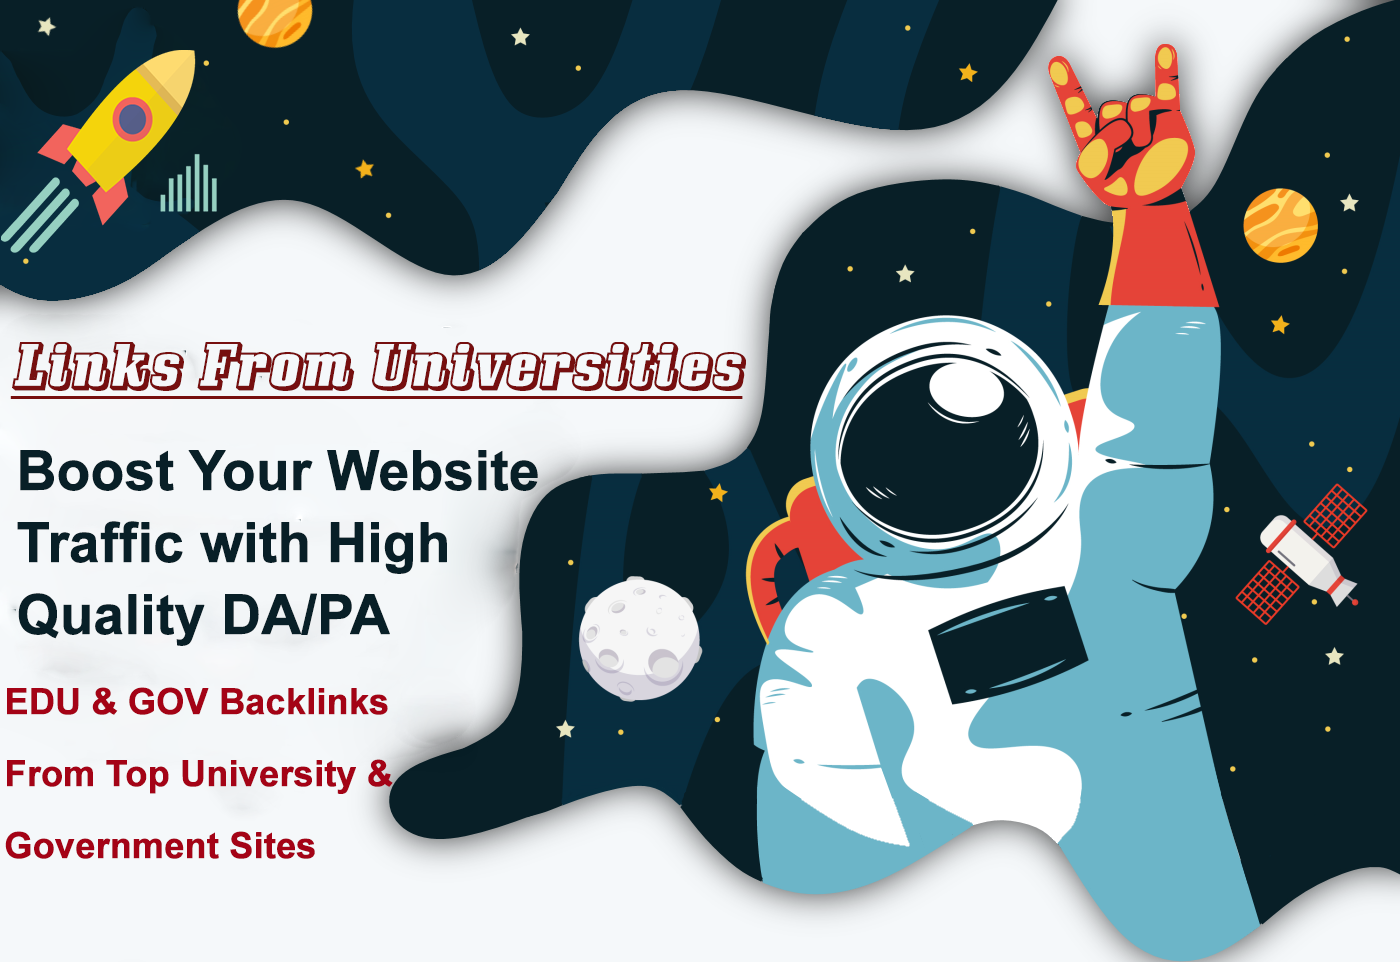 EDU BACKLINKS MANUALLY CREATED Boost Your Website Traffic with High Quality DA/PA Backlinks